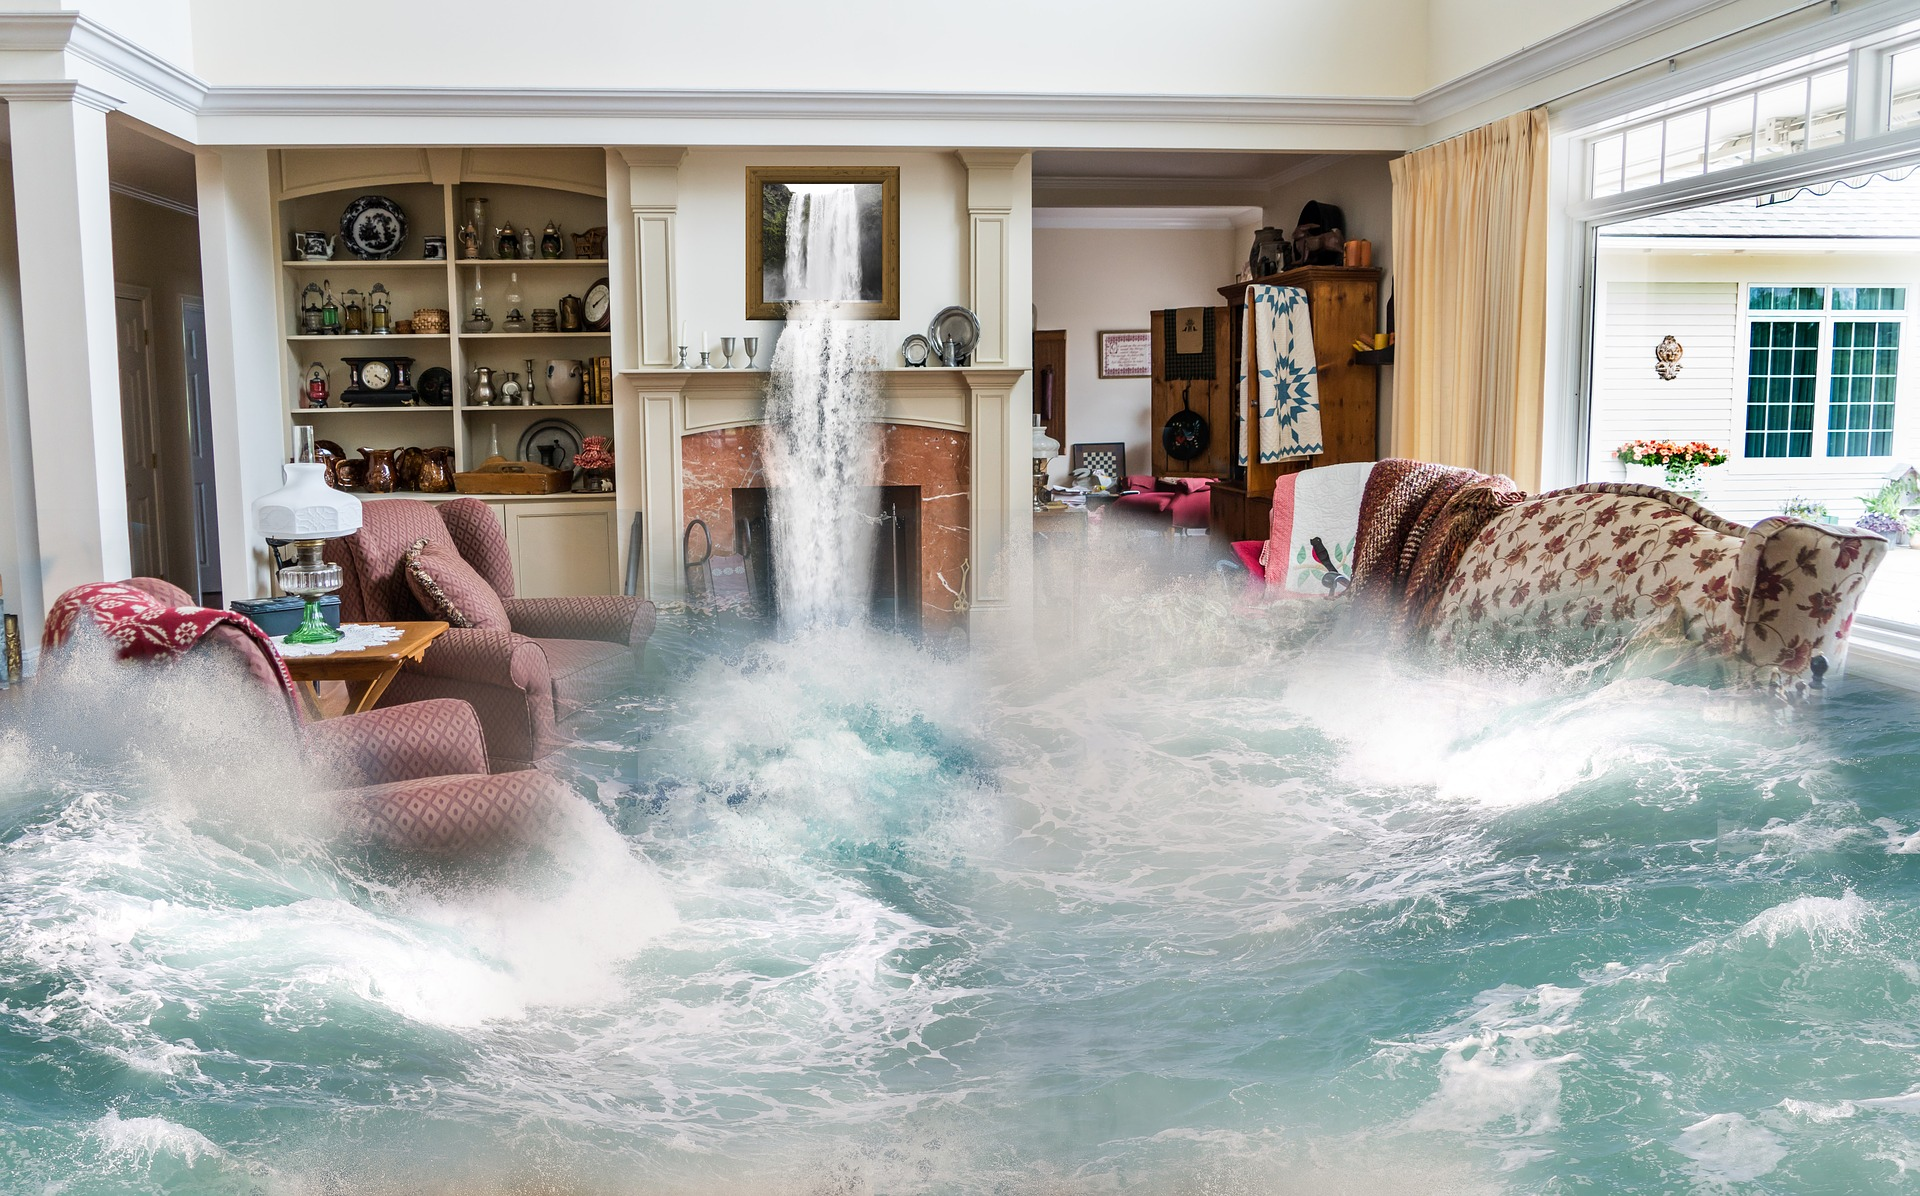 Flooding house